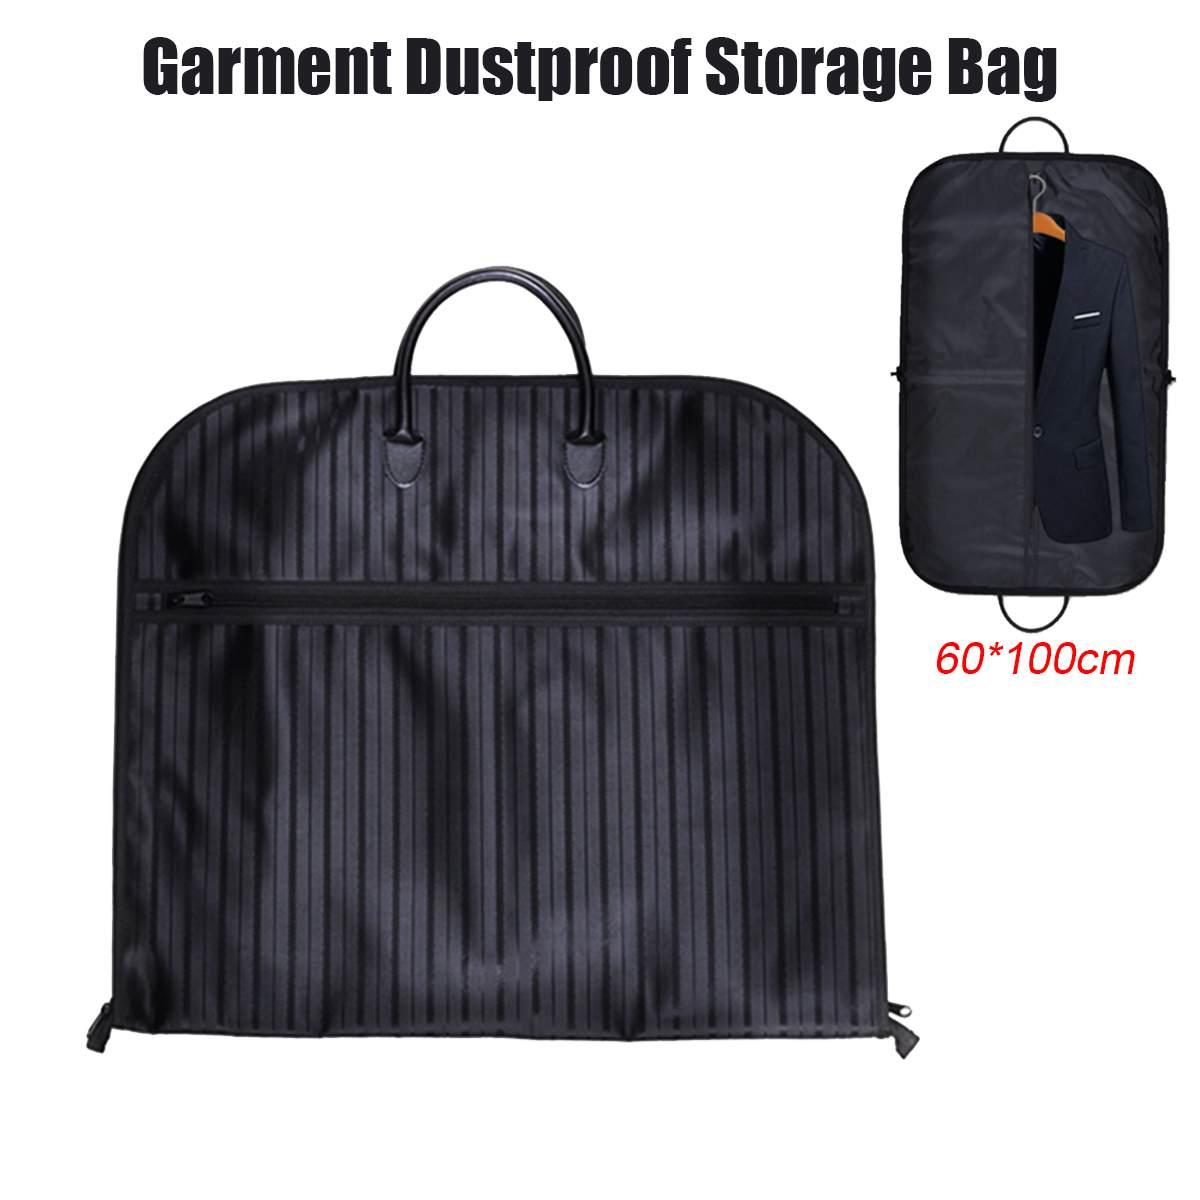 60*100cm Dust proof Dress Clothes Cover Case Suit Dress Garment Bag Storage Travel Carrier Coat Jacket Home Zipper Protector|Clothing Covers| |  - title=